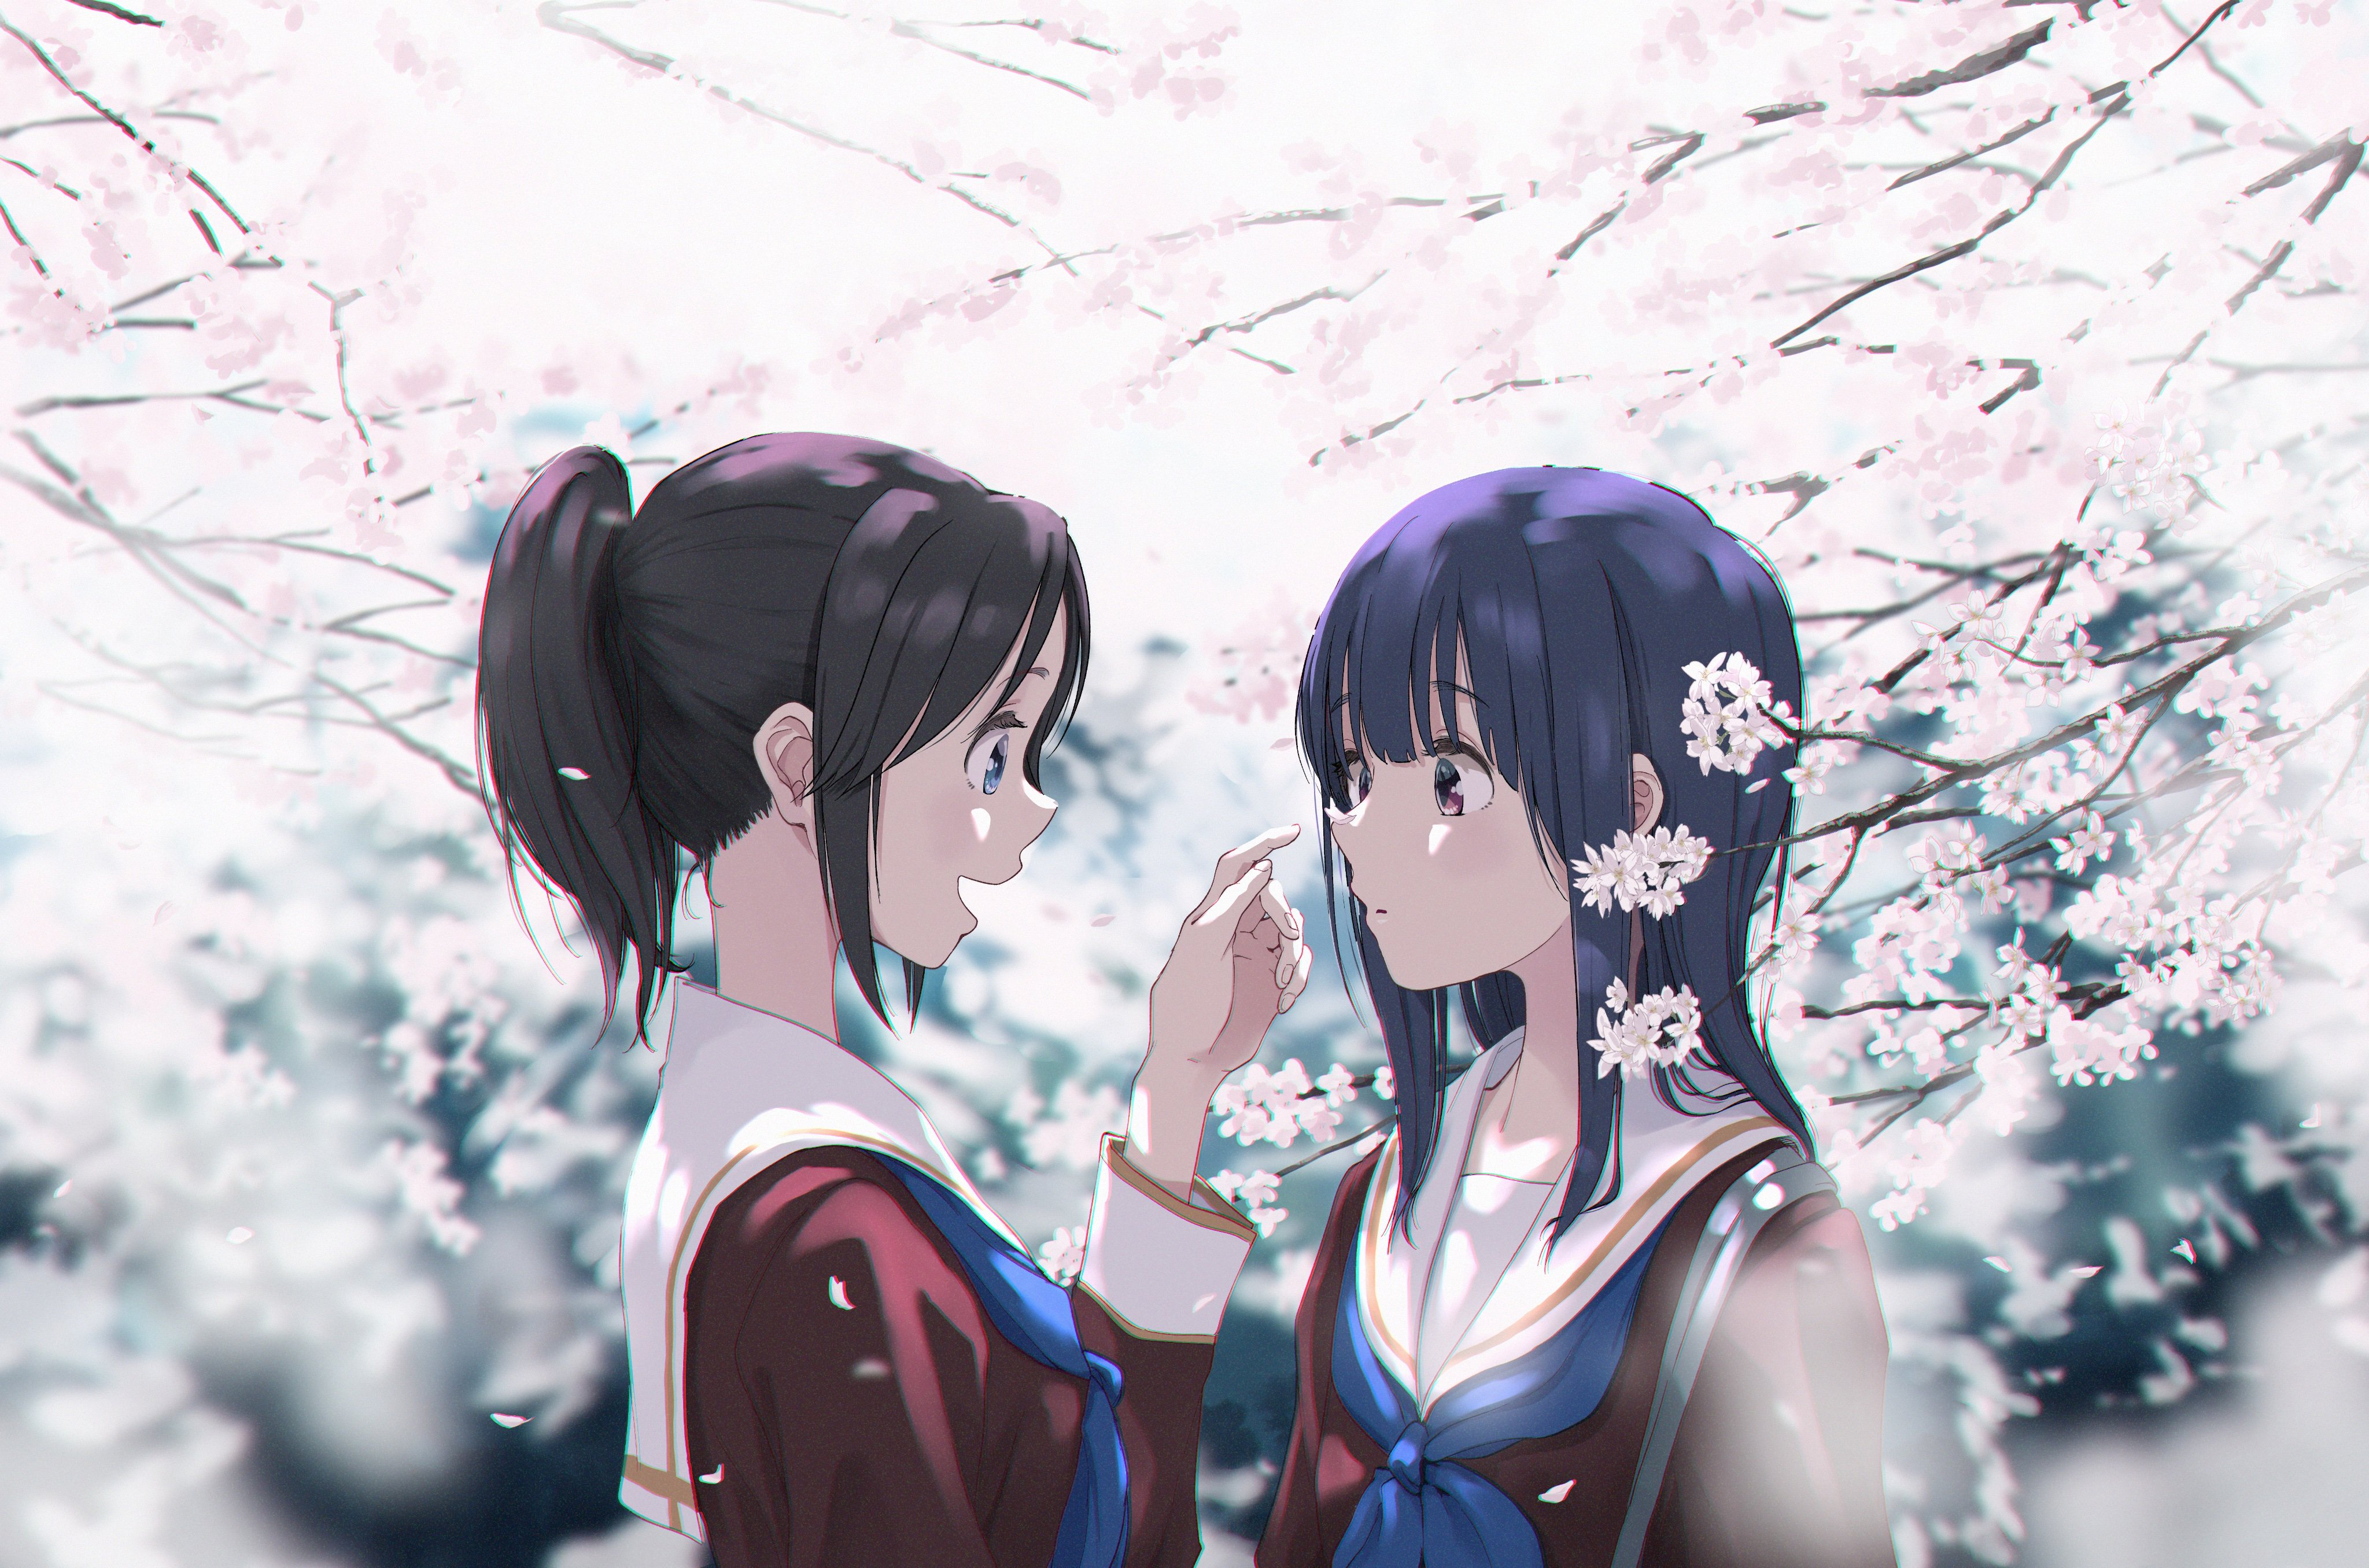 Anime 4096x2711 anime anime girls Liz to Aoi Tori Yoroizuka Mizore (Hibike! Euphonium) Kasaki Nozomi Sakura blossom school uniform